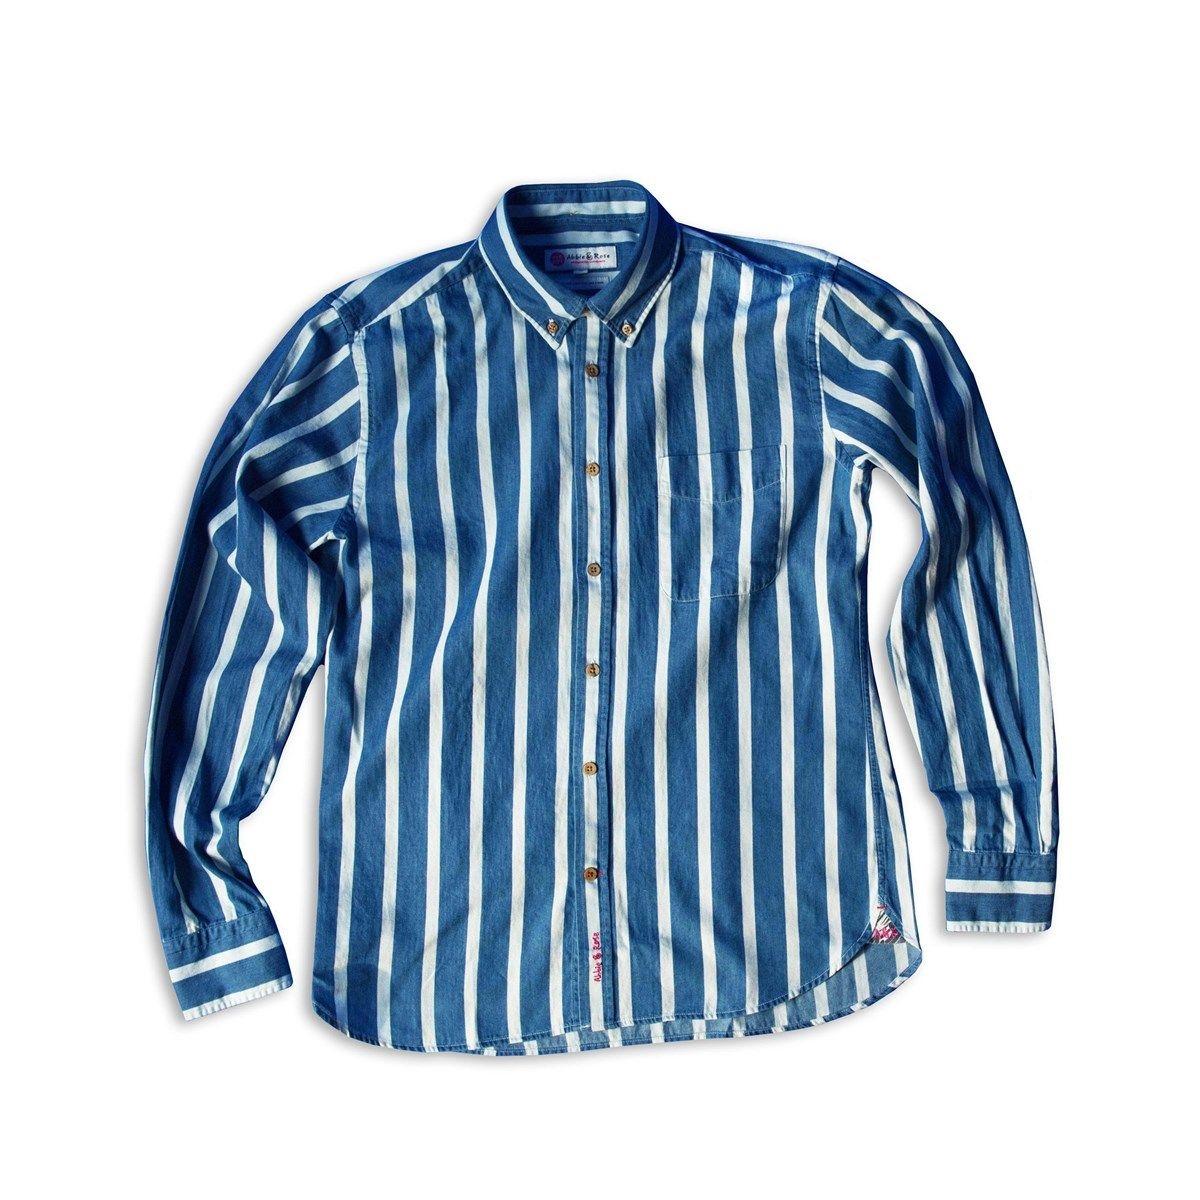 Chemise denim rayures blanches col à pointes boutonnées